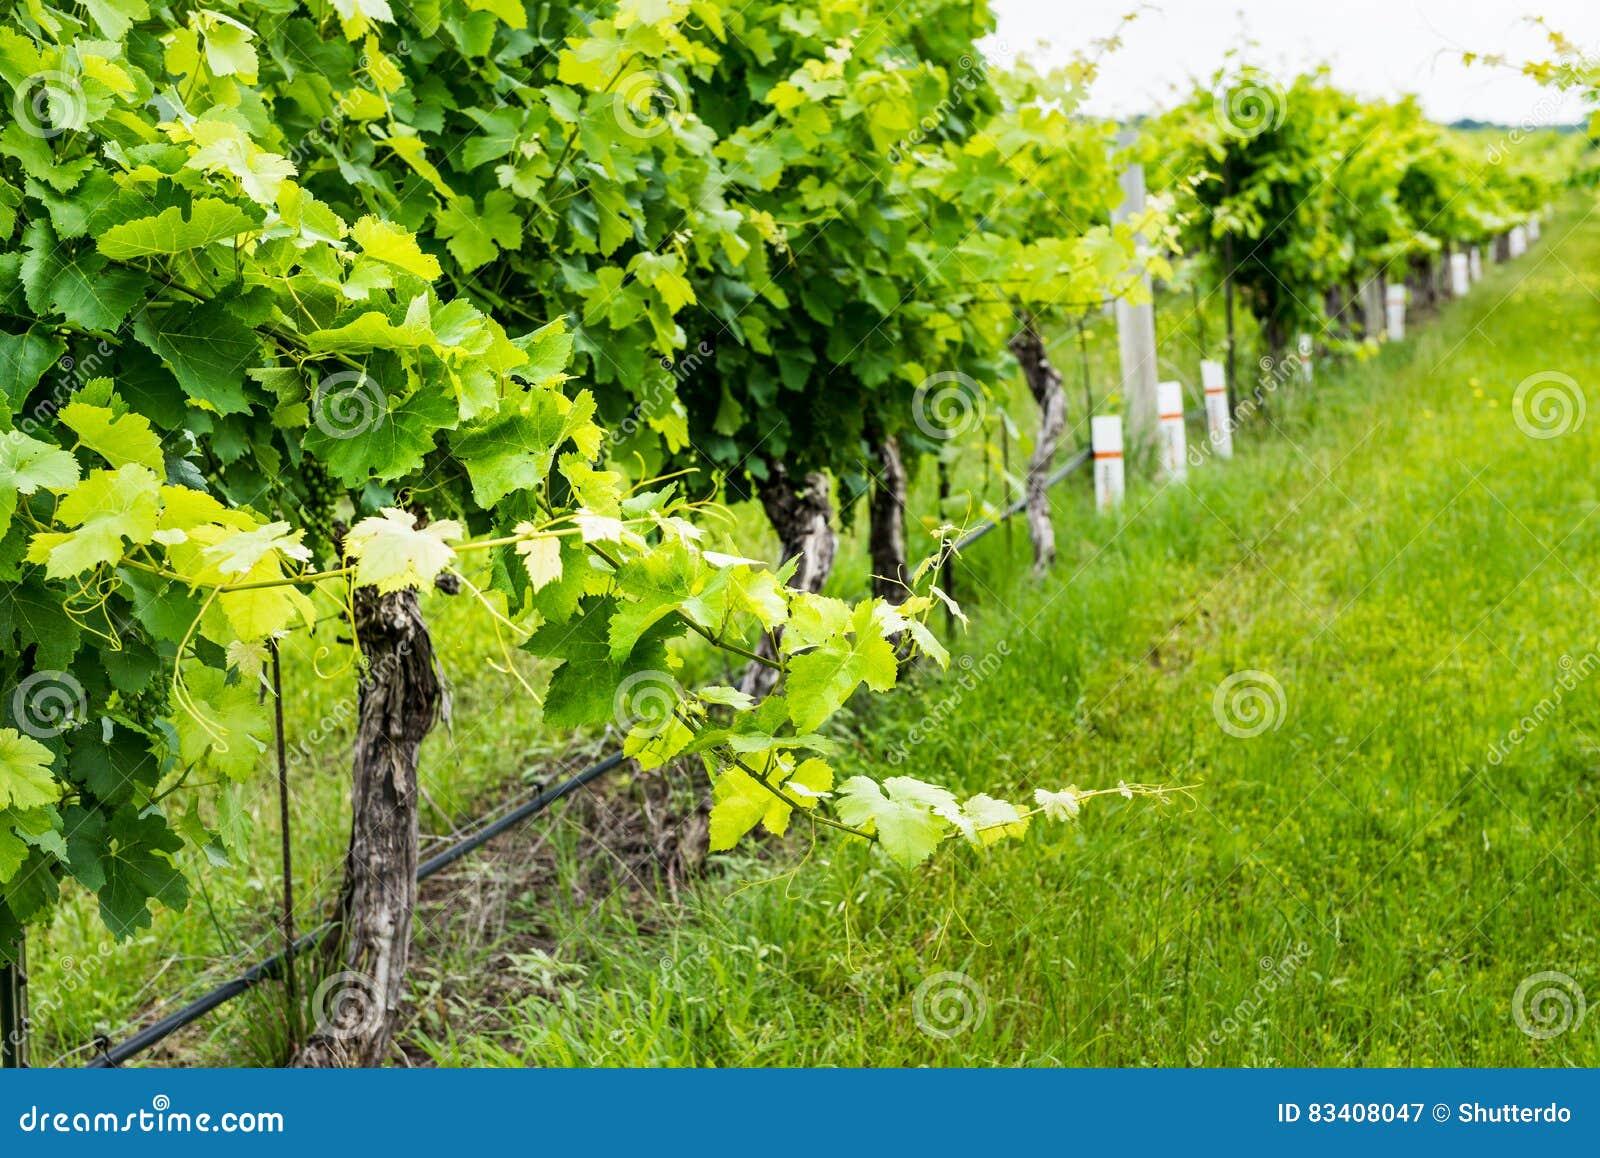 Closeup view of a grape vine with row of grapes